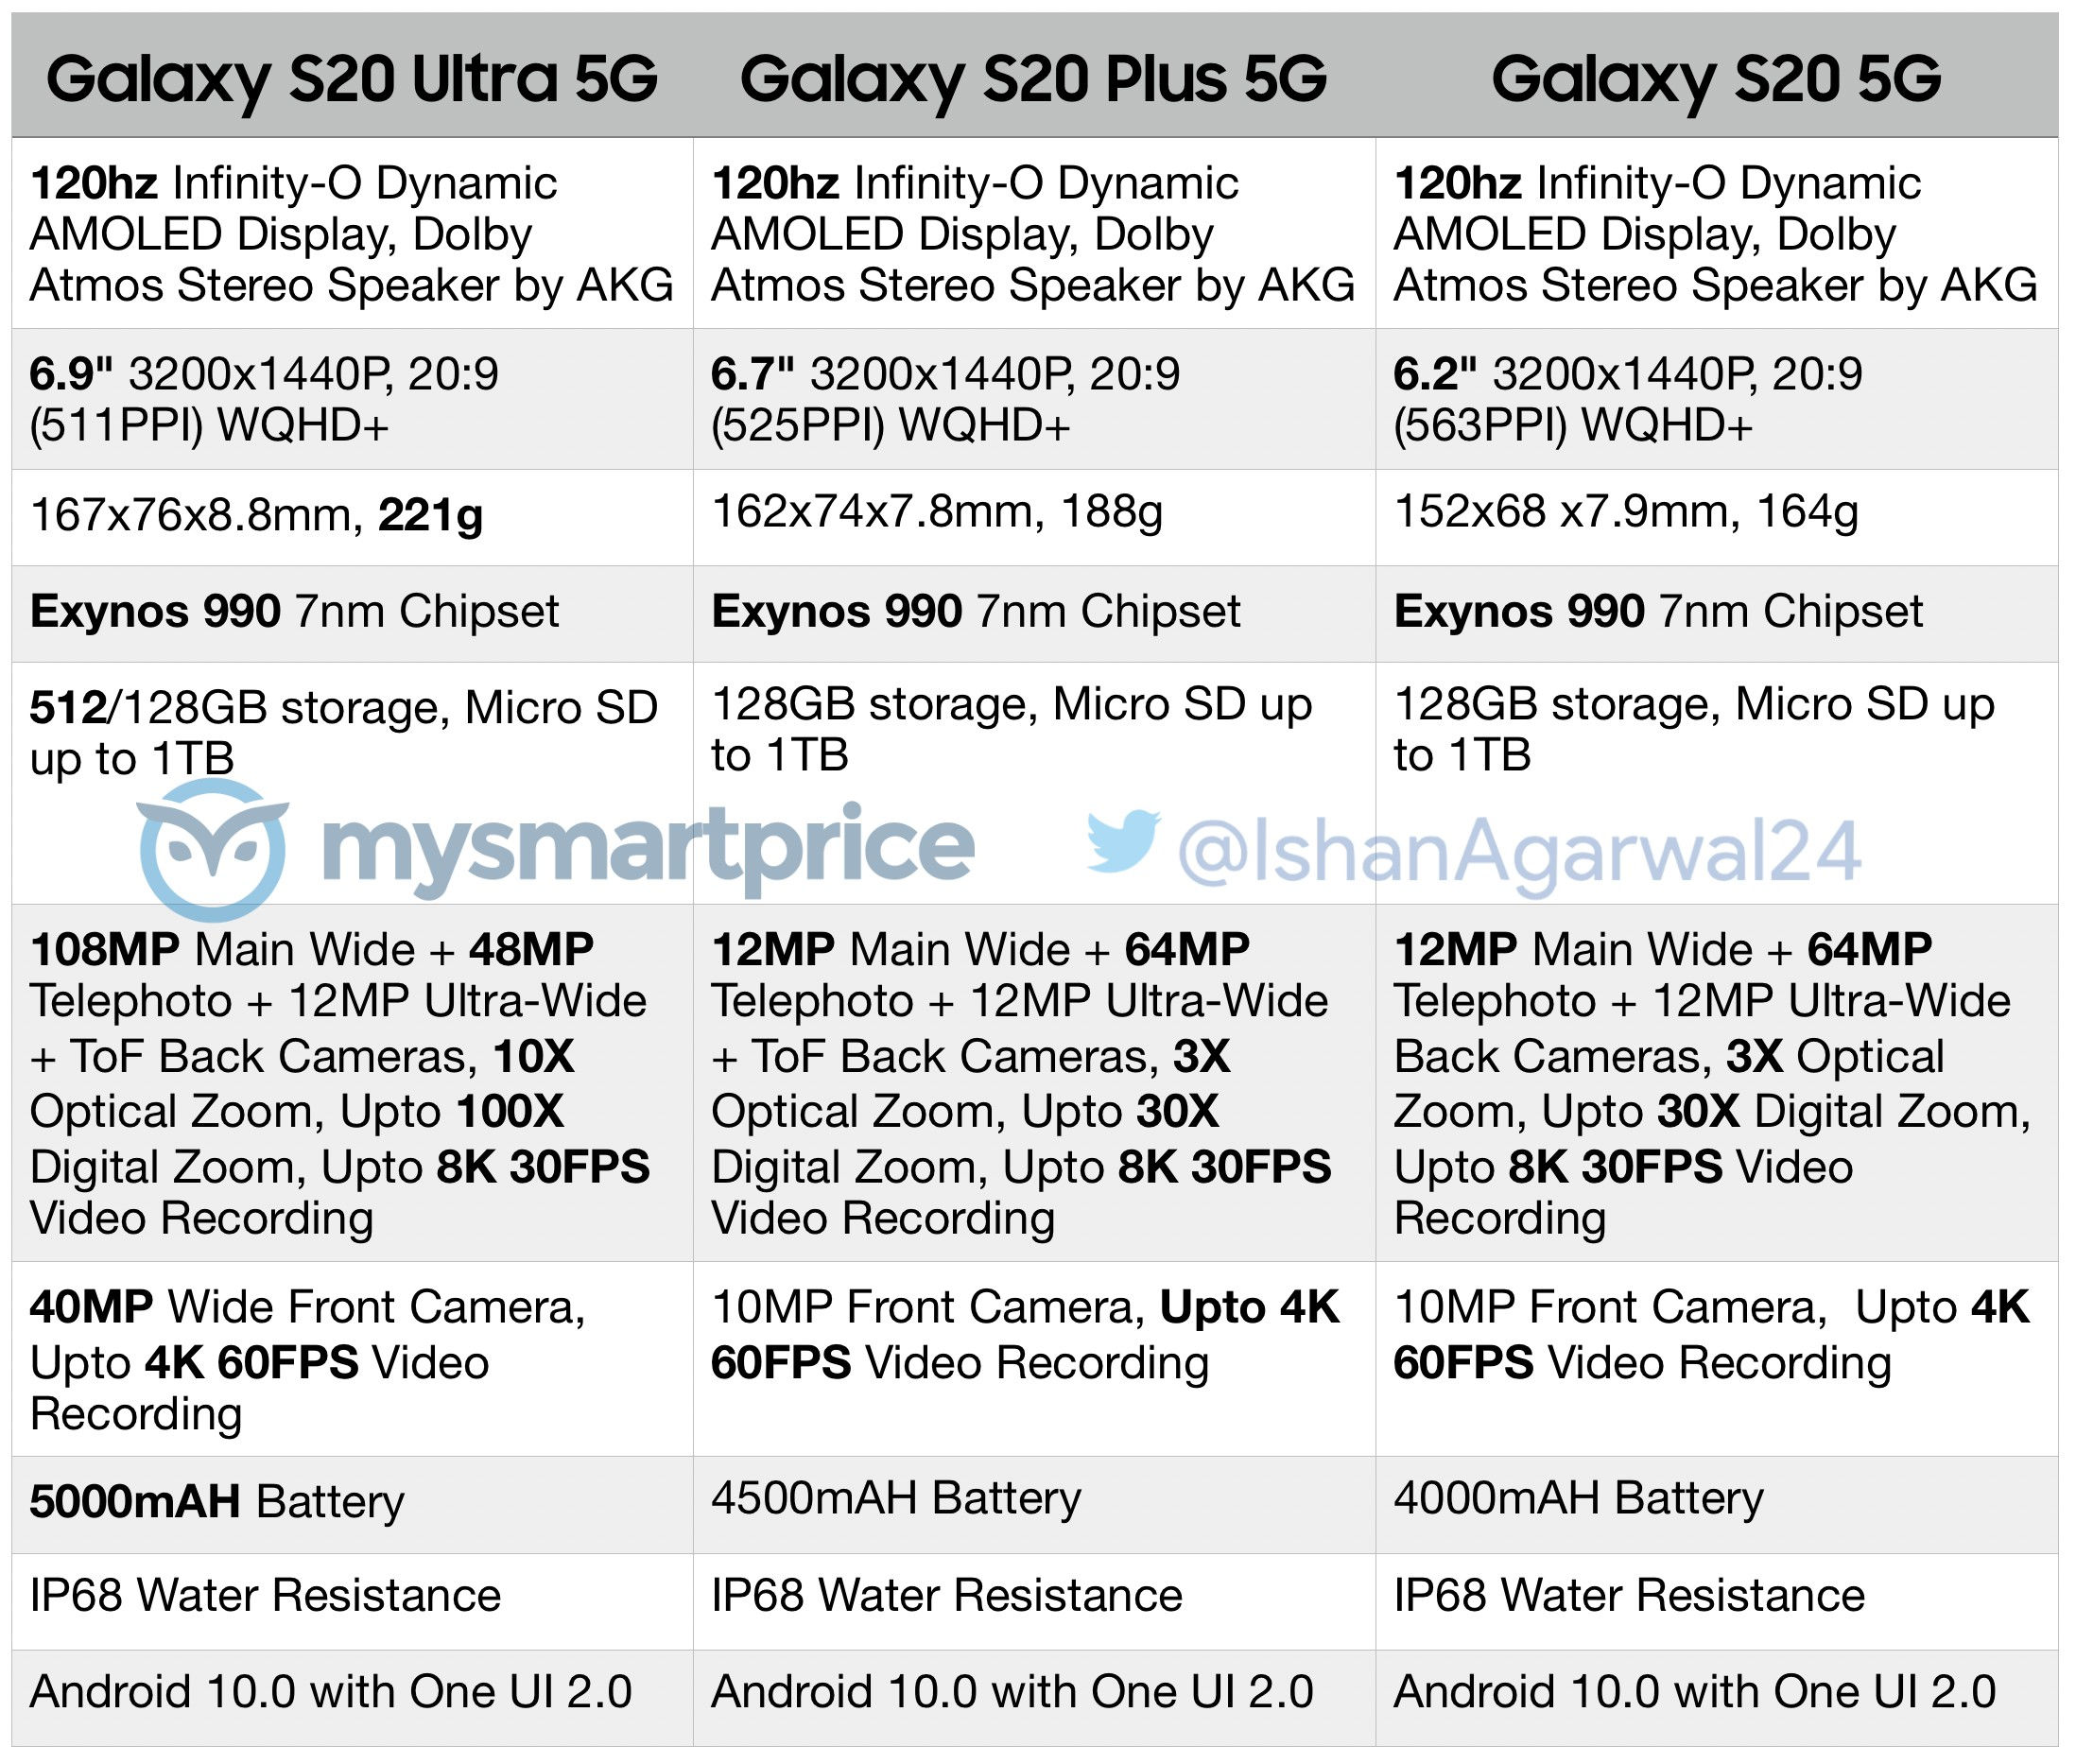 Samsung Galaxy S20 5G Galaxy S20 Plus 5G Galaxy S20 Ultra 5G specyfikacja